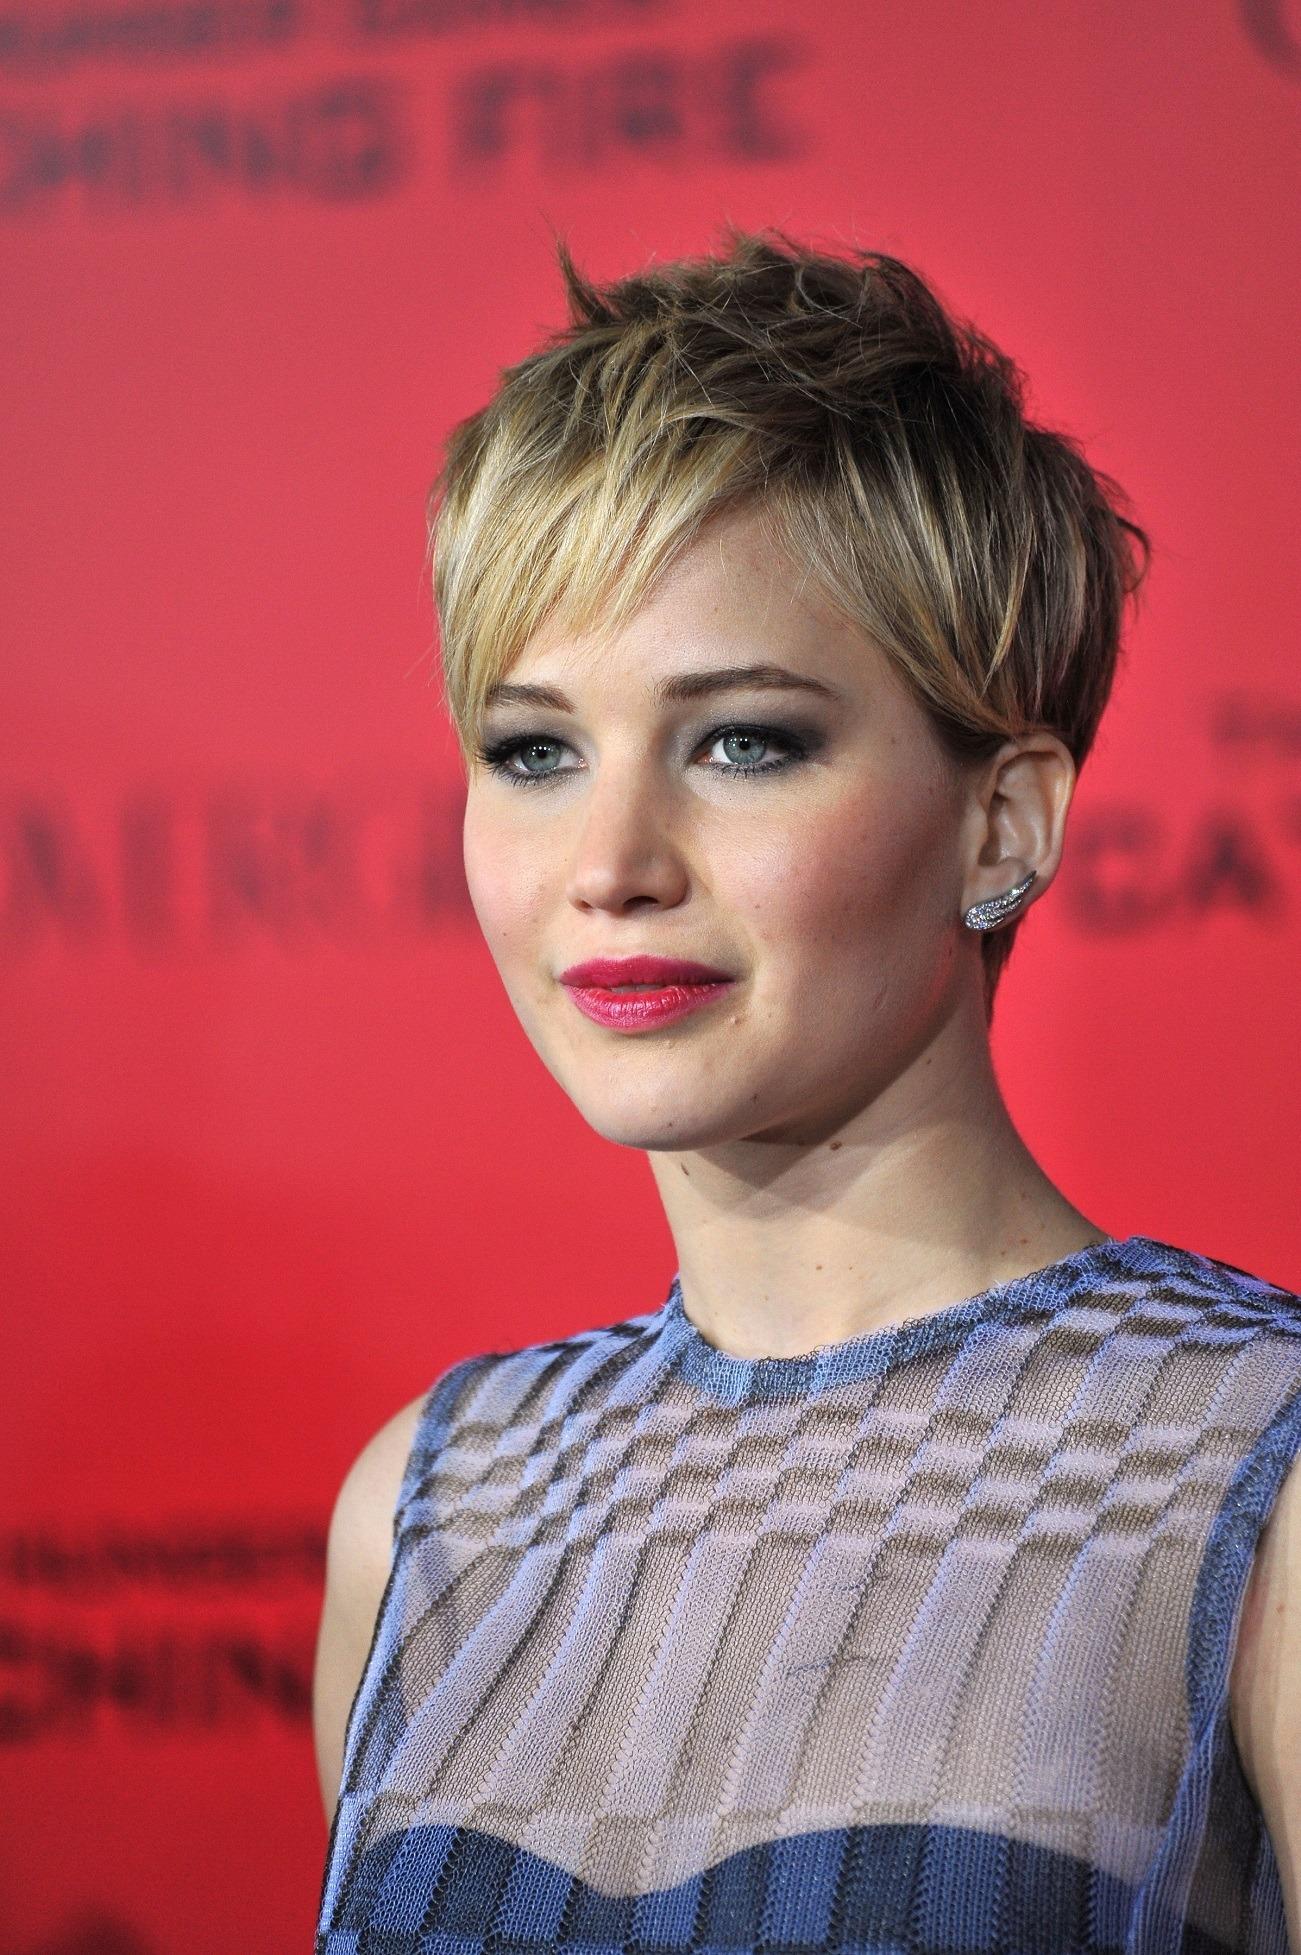 Jennifer Lawrence dengan mode rambut pixie cut untuk wanita karier